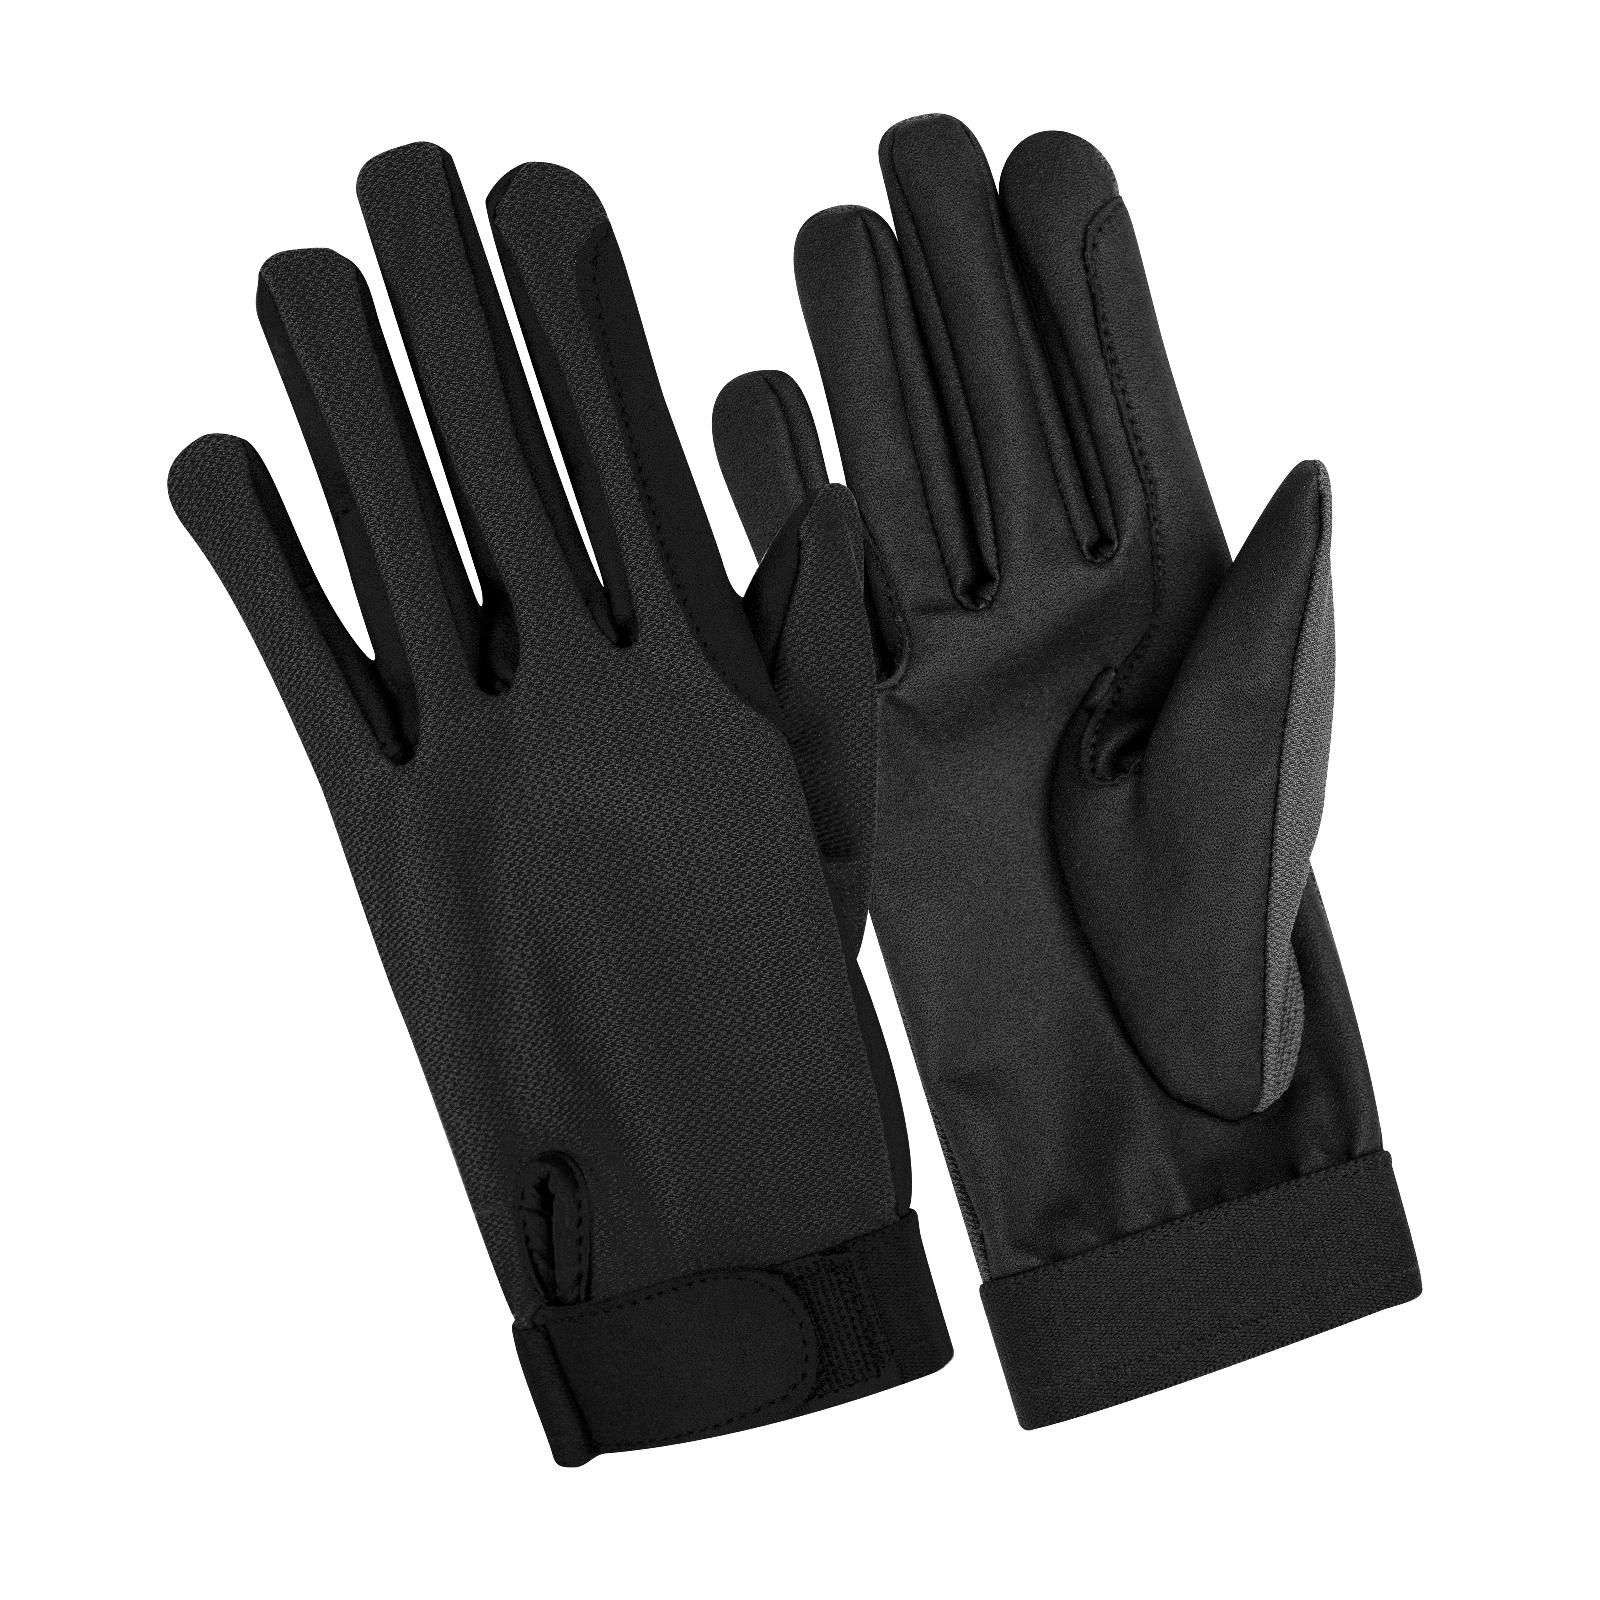 Perri's Mesh Summer Riding Gloves - Child Size